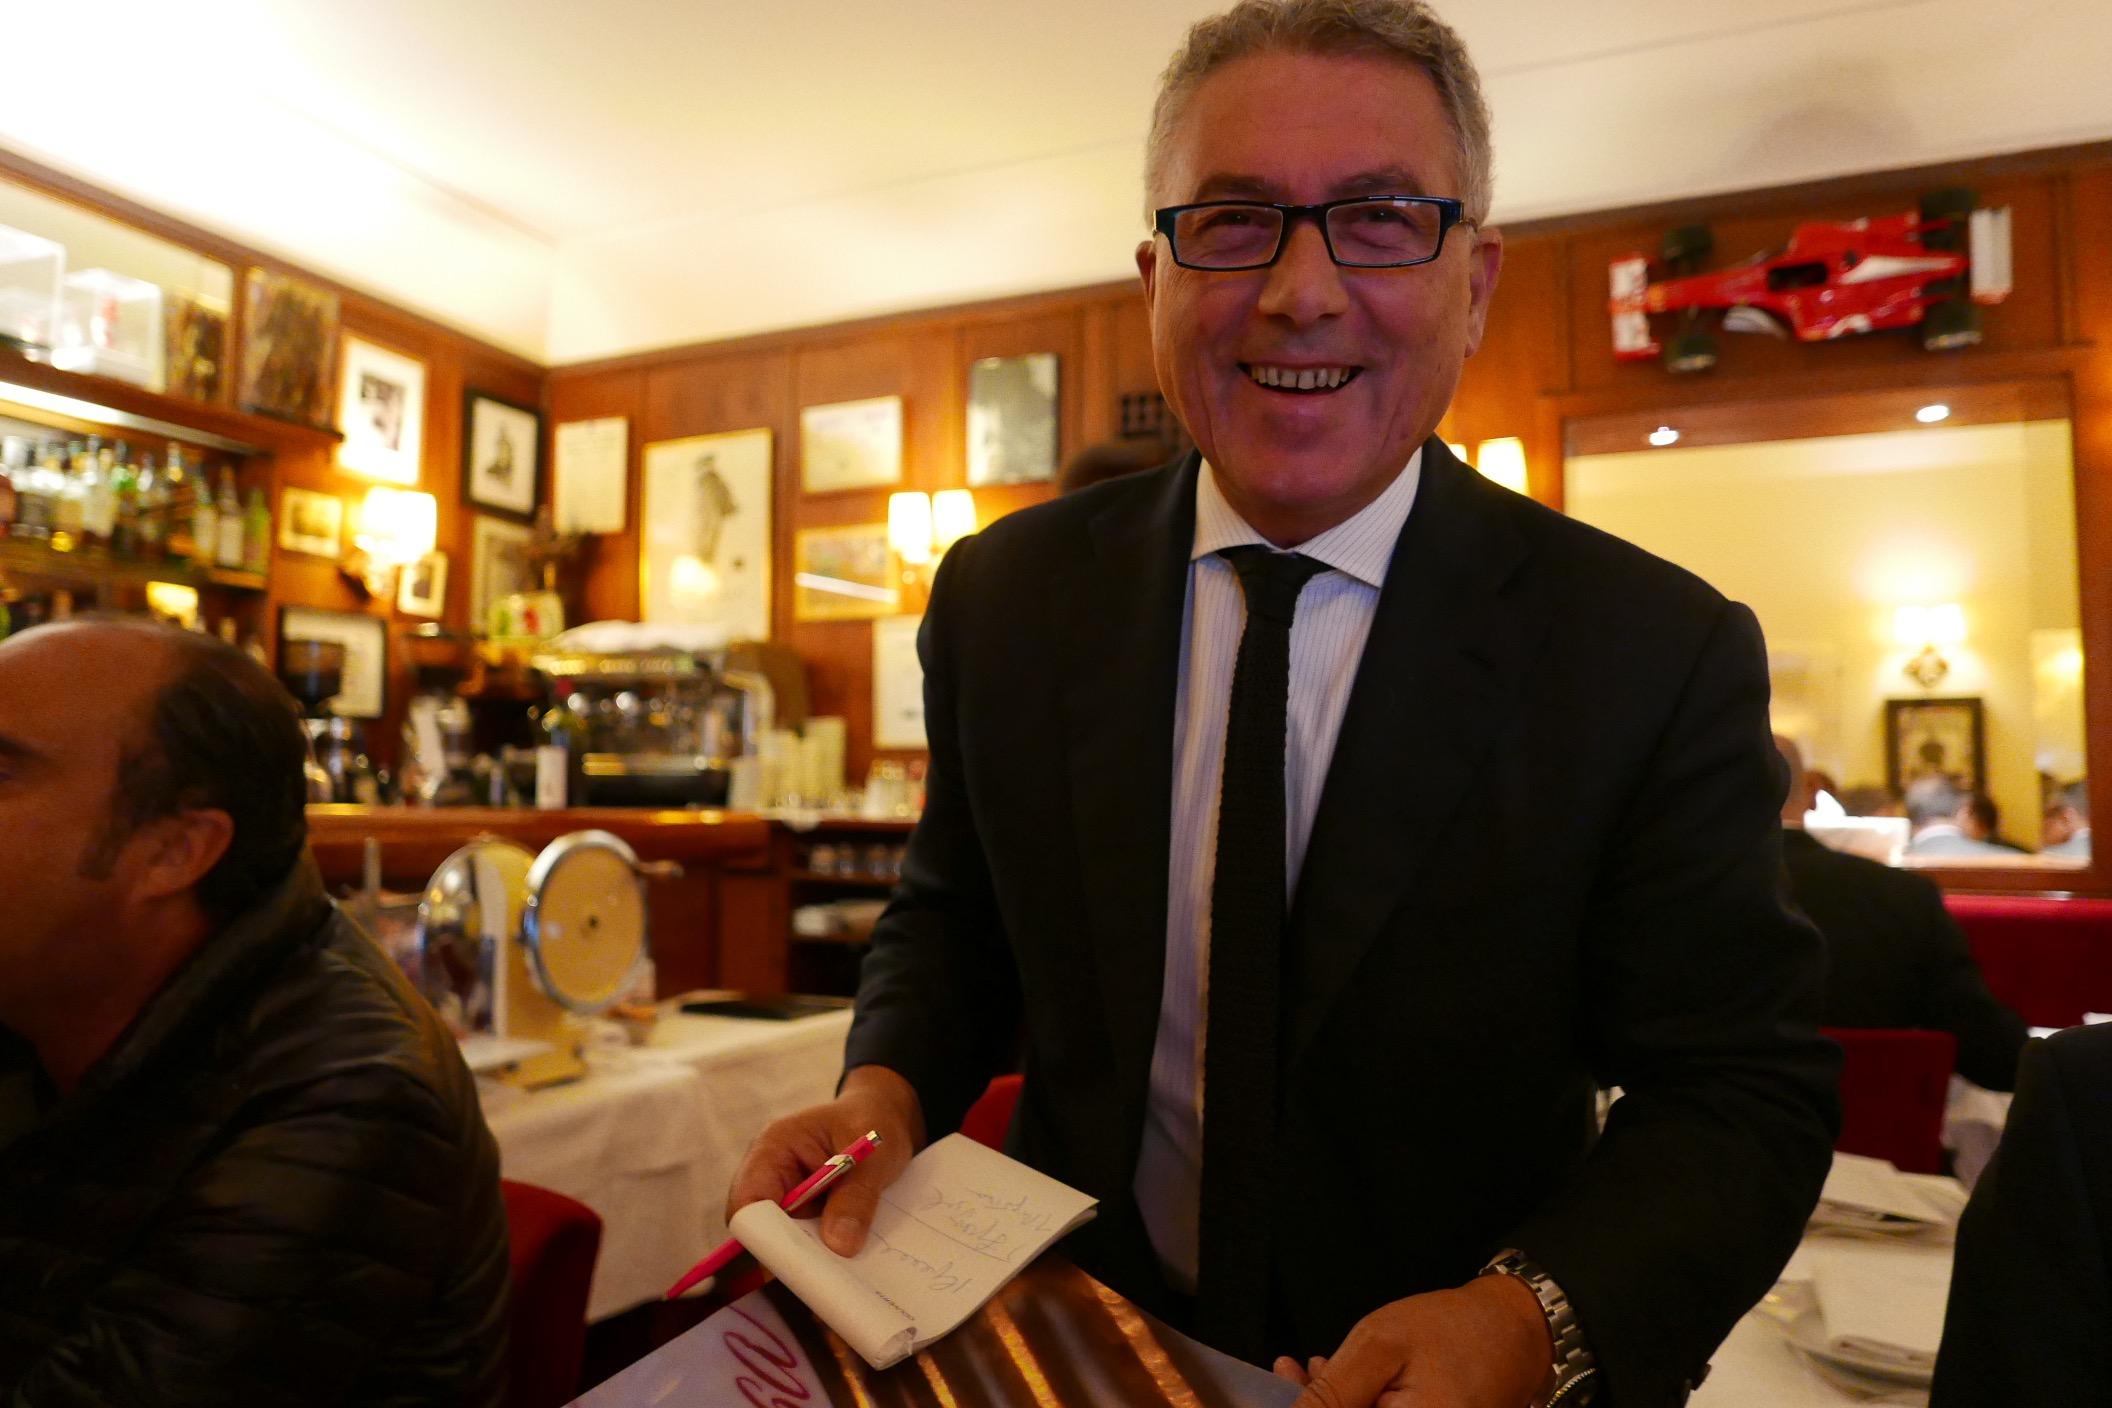 stresa restaurant italien paris 8e le club des faiola. Black Bedroom Furniture Sets. Home Design Ideas